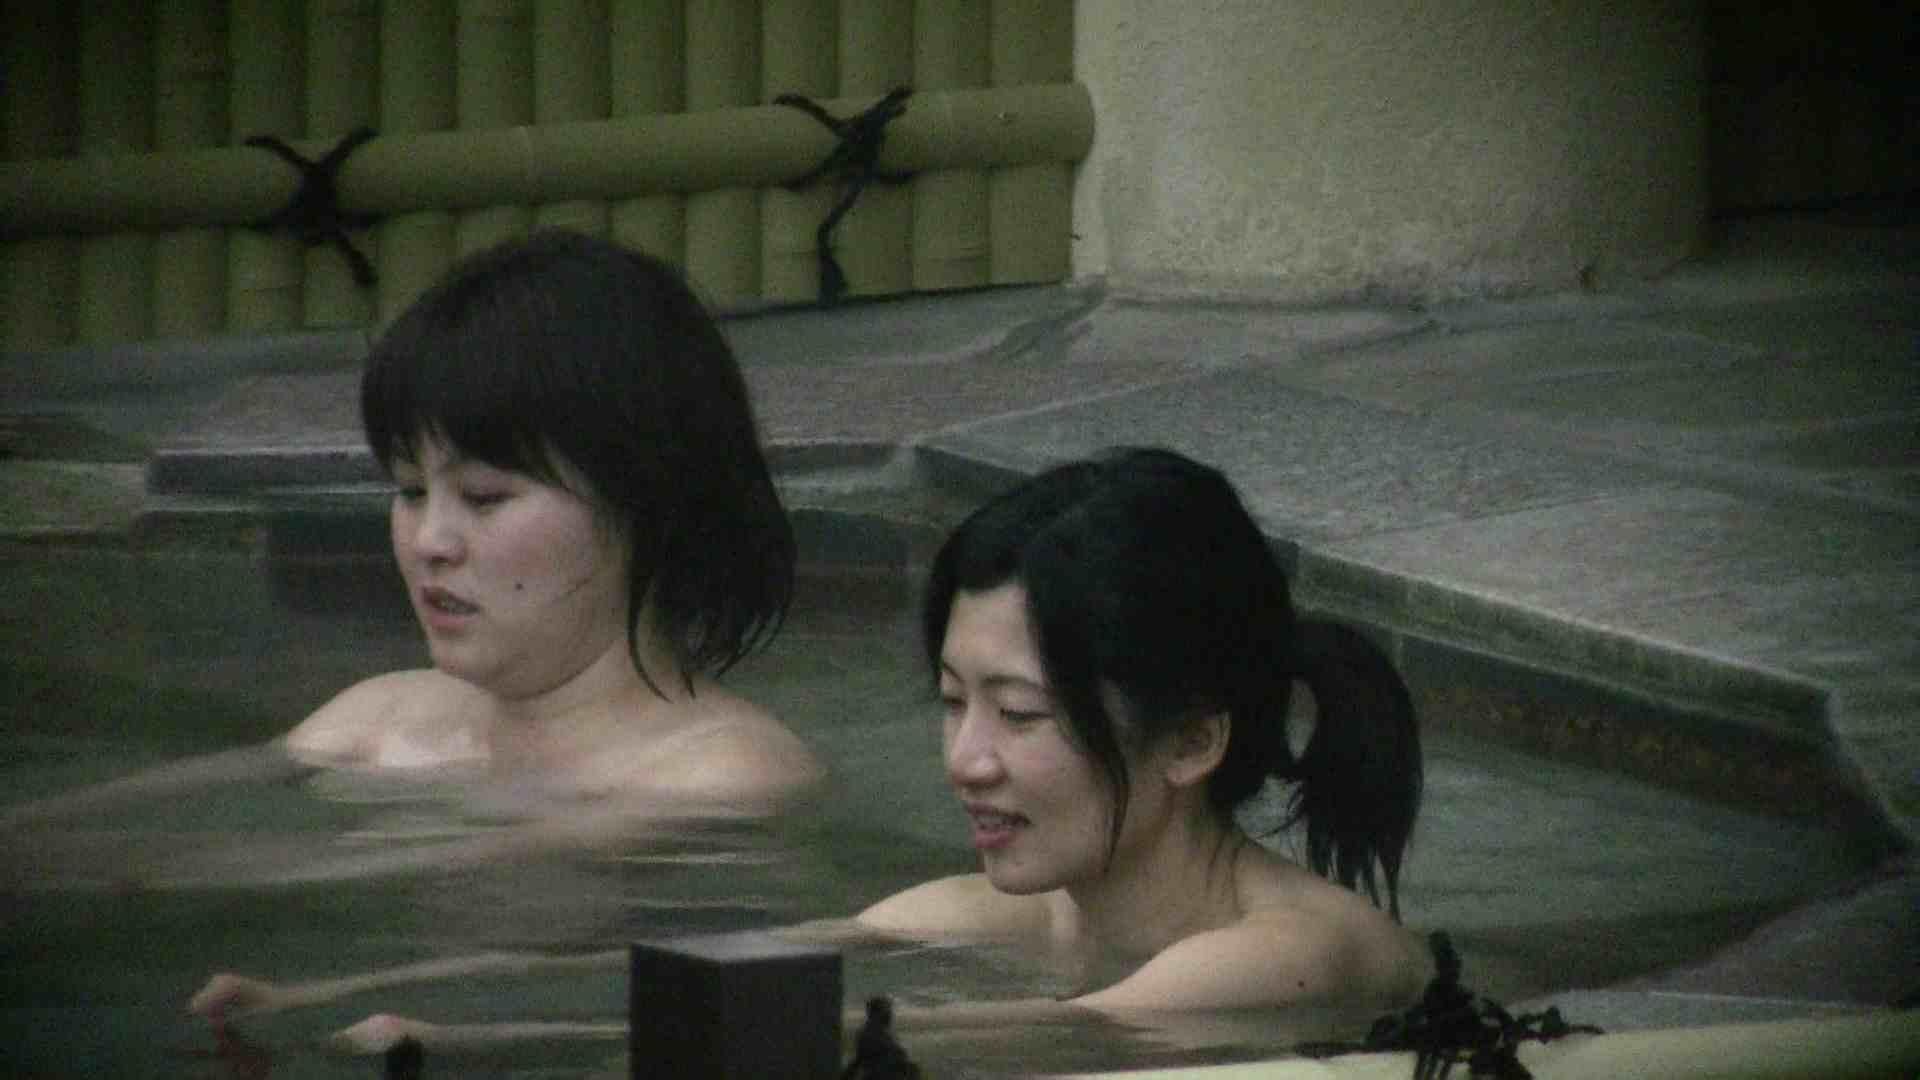 Aquaな露天風呂Vol.539 OL女体  88連発 36